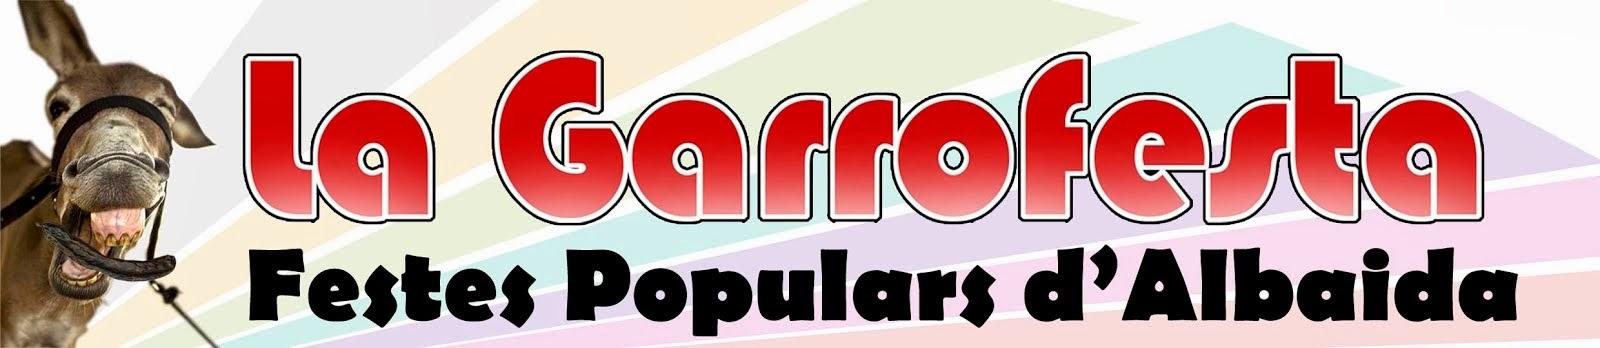 Festes Populars d'Albaida